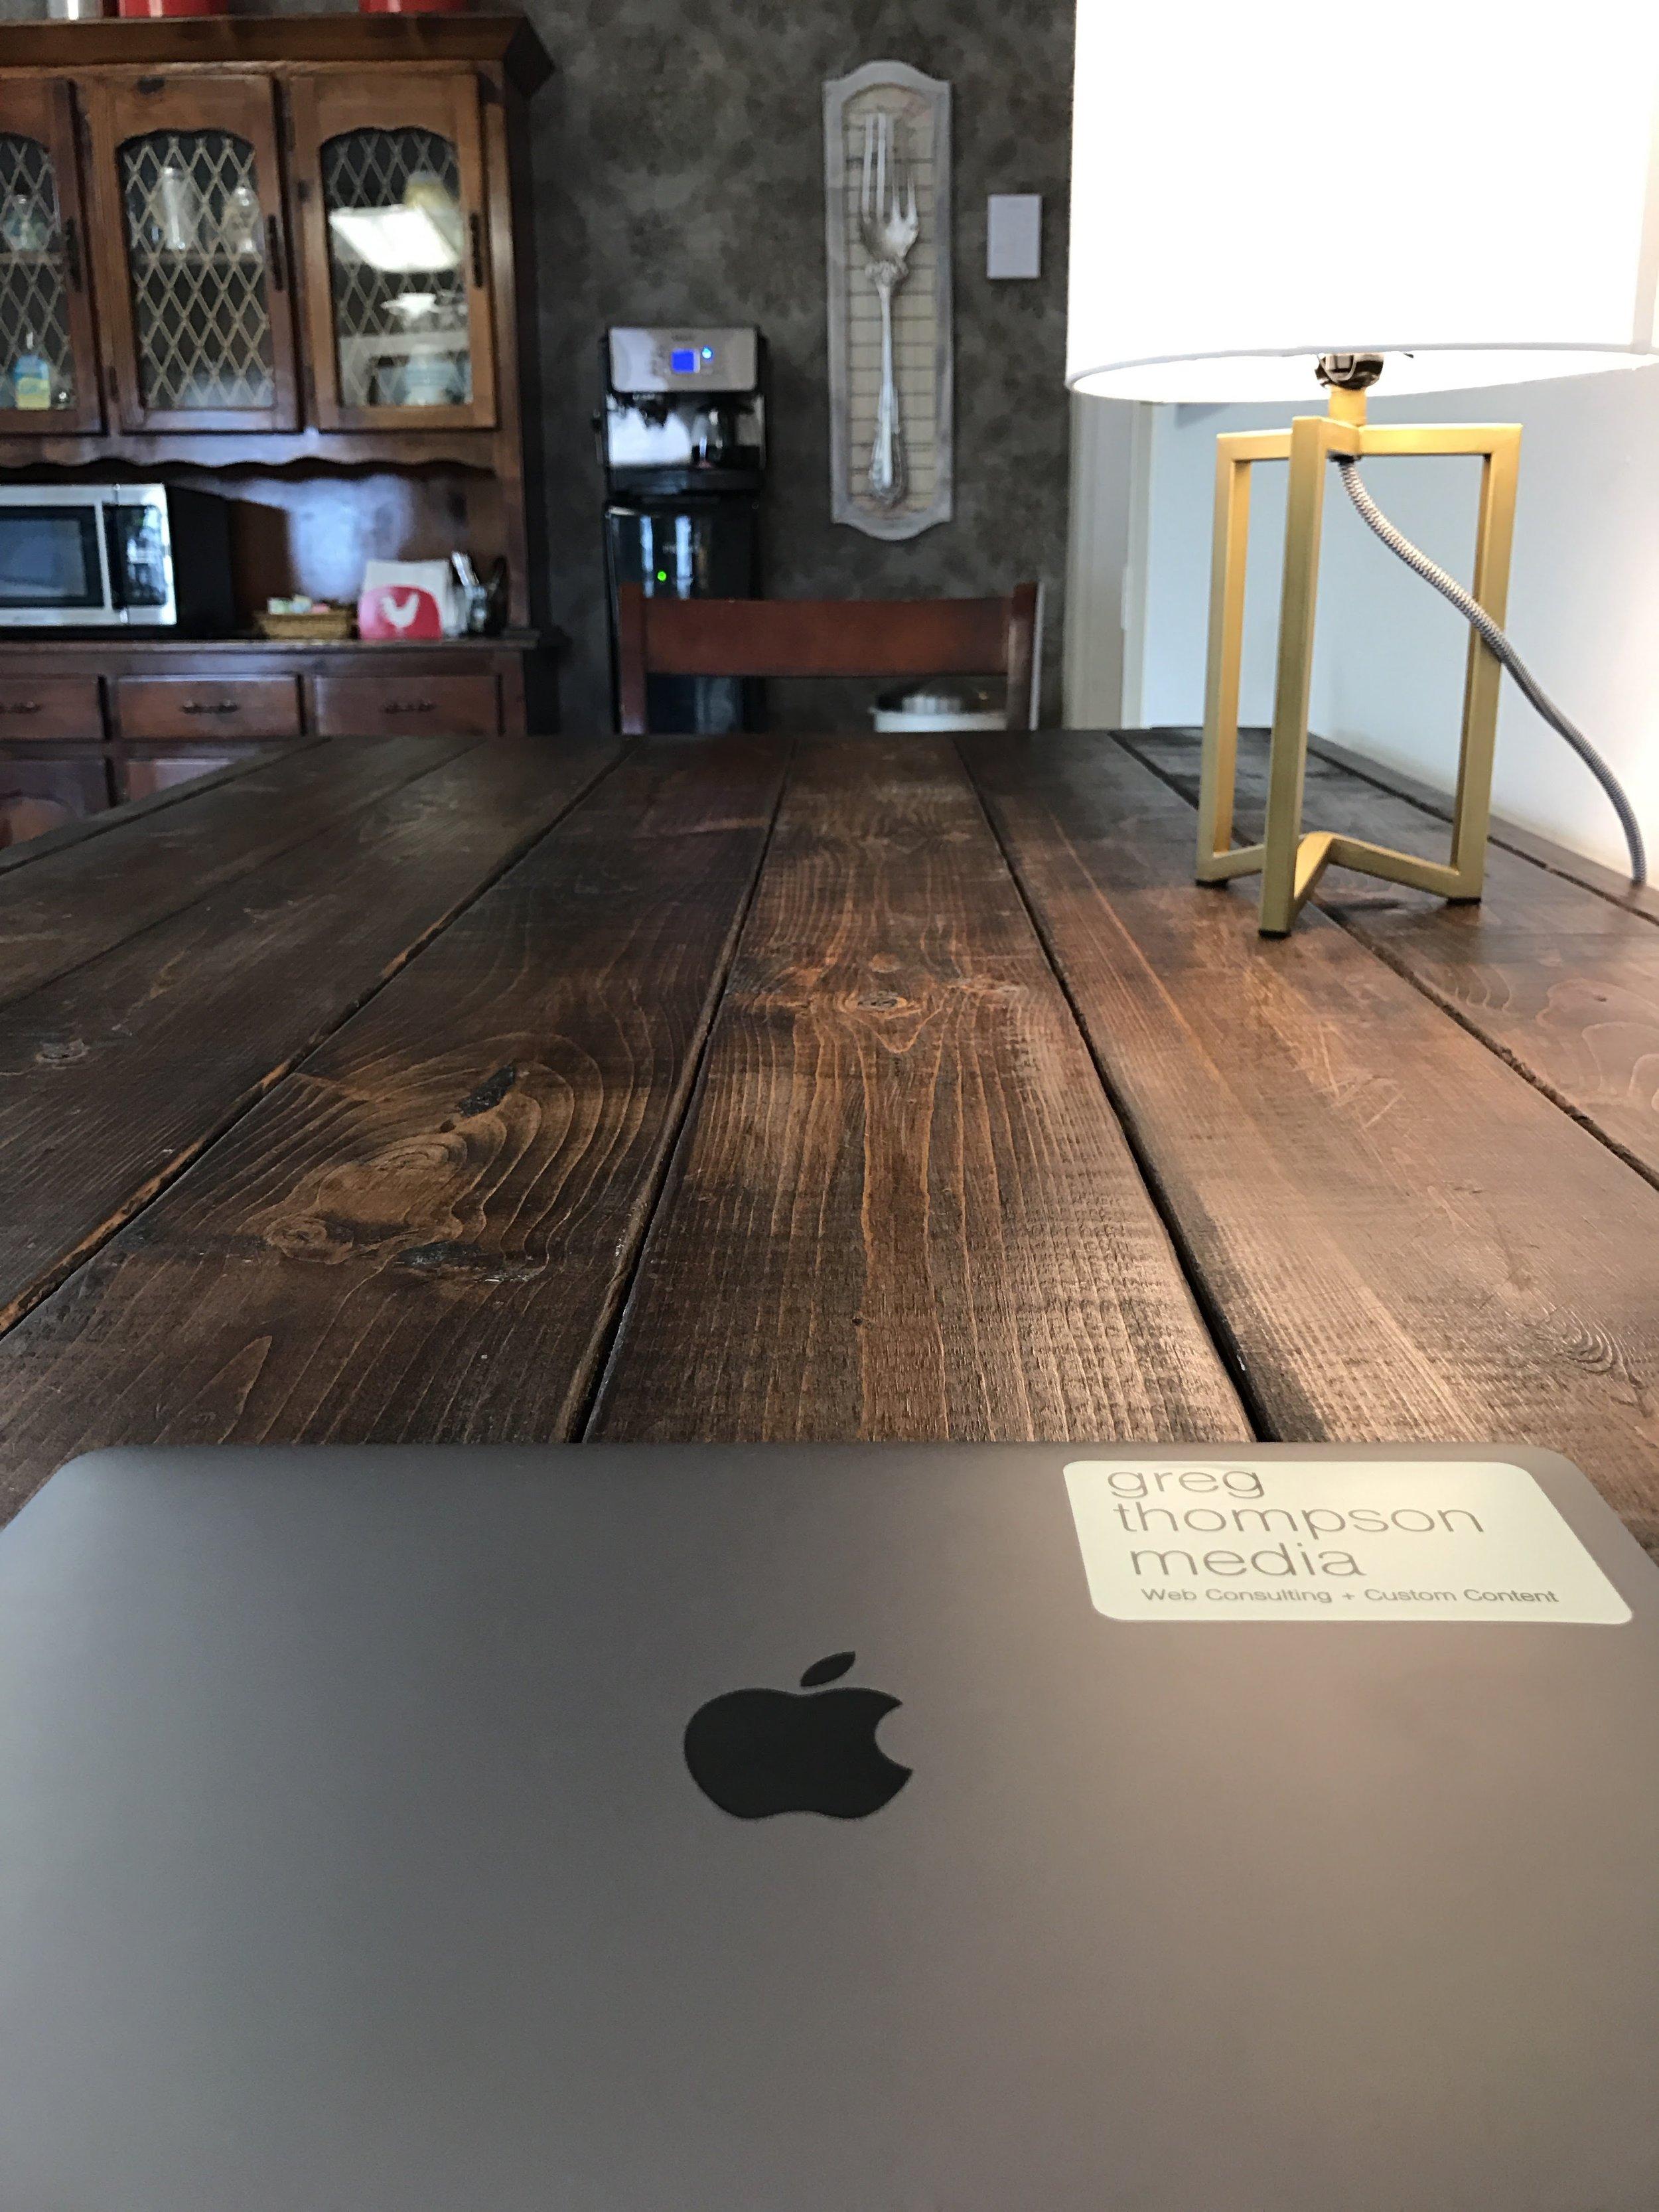 Work Nimbly (Coworking Space), Williamsburg, VA - January 2017